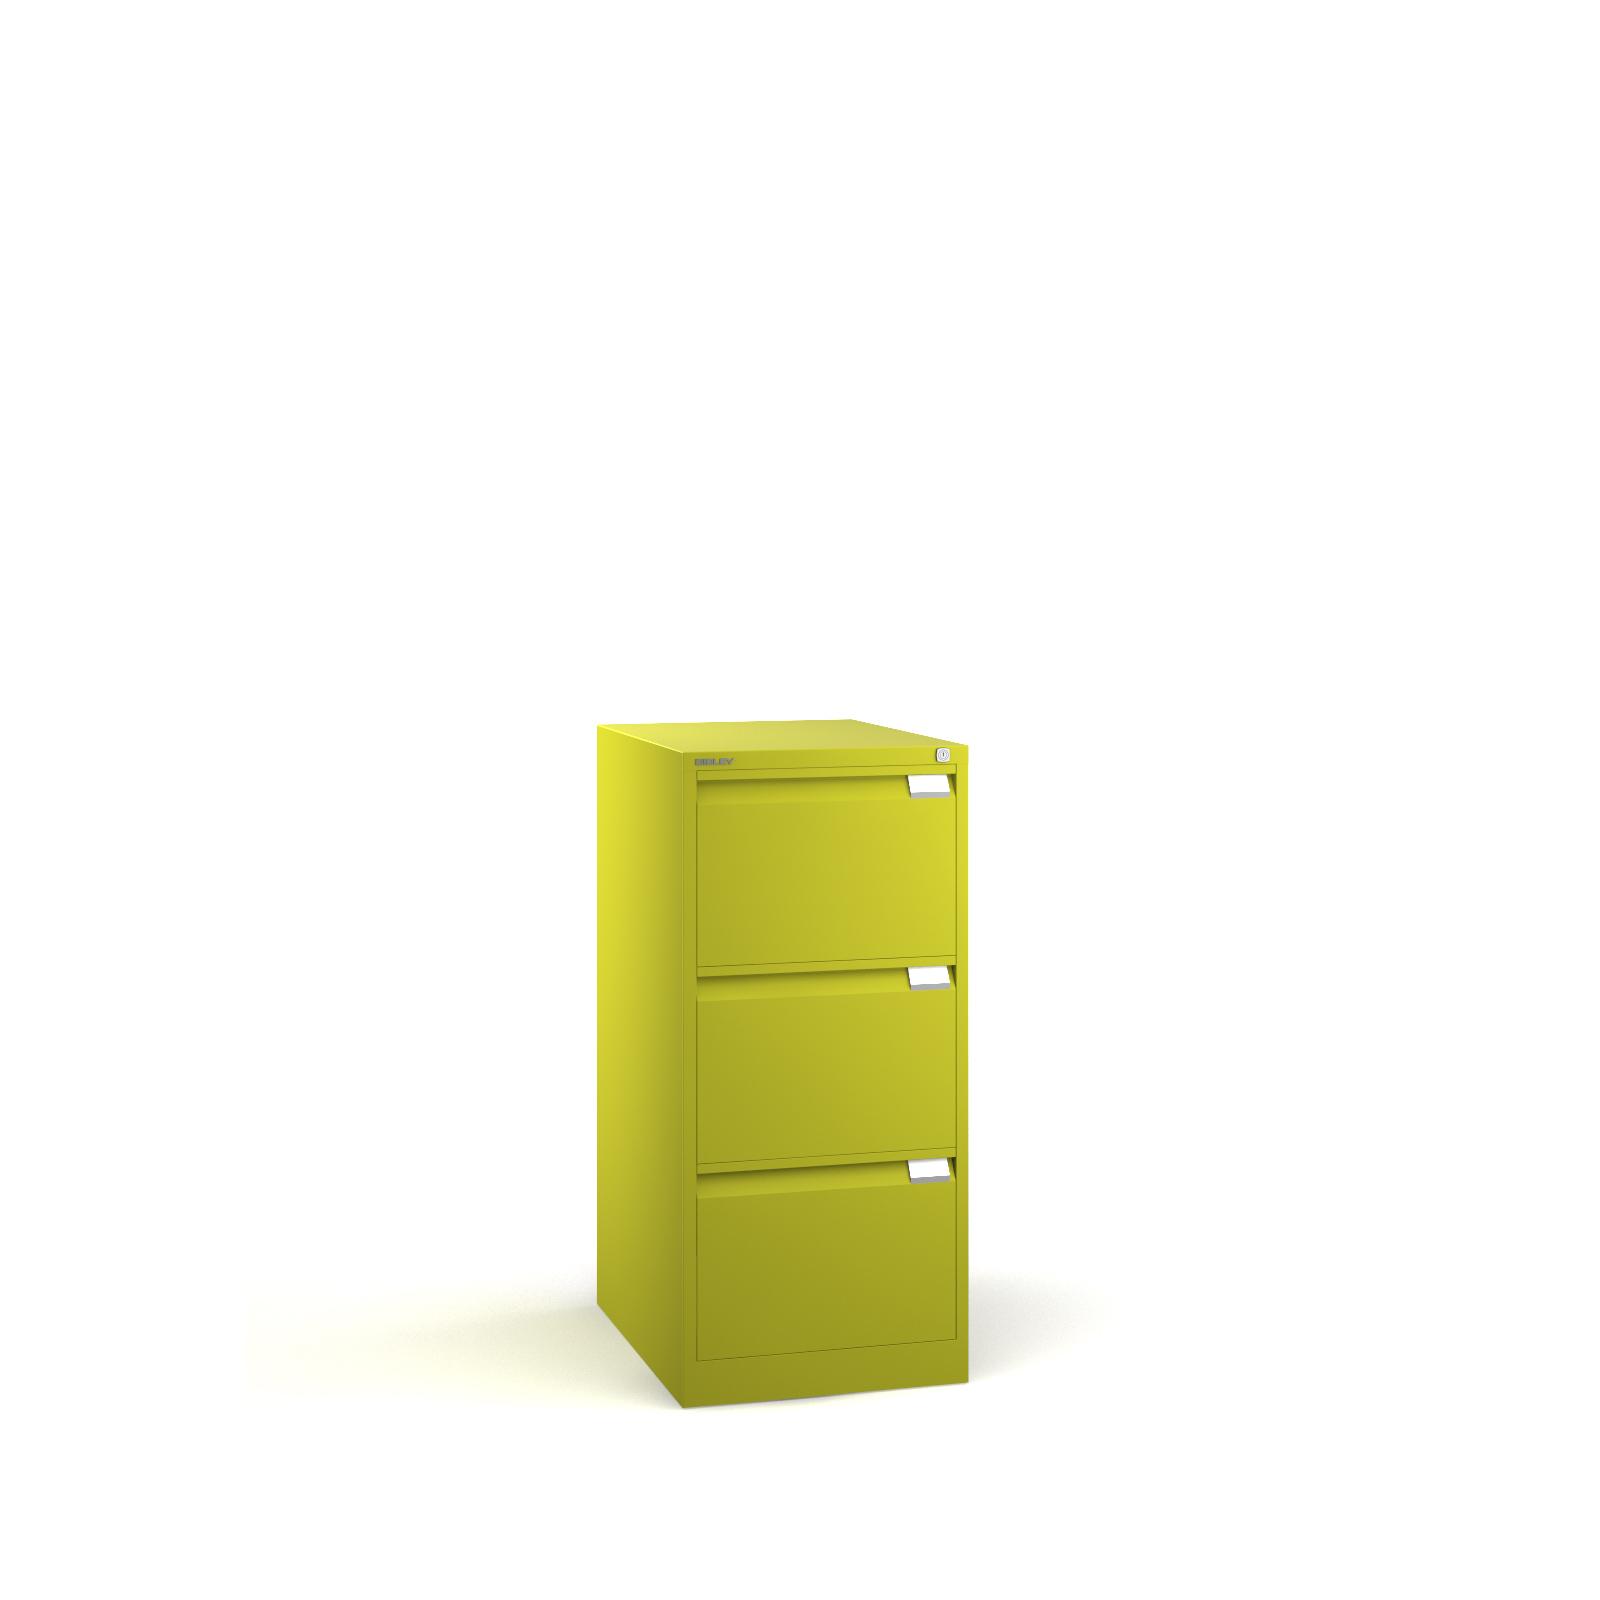 Bisley 3 drawer BS filing cabinet 1016mm - green